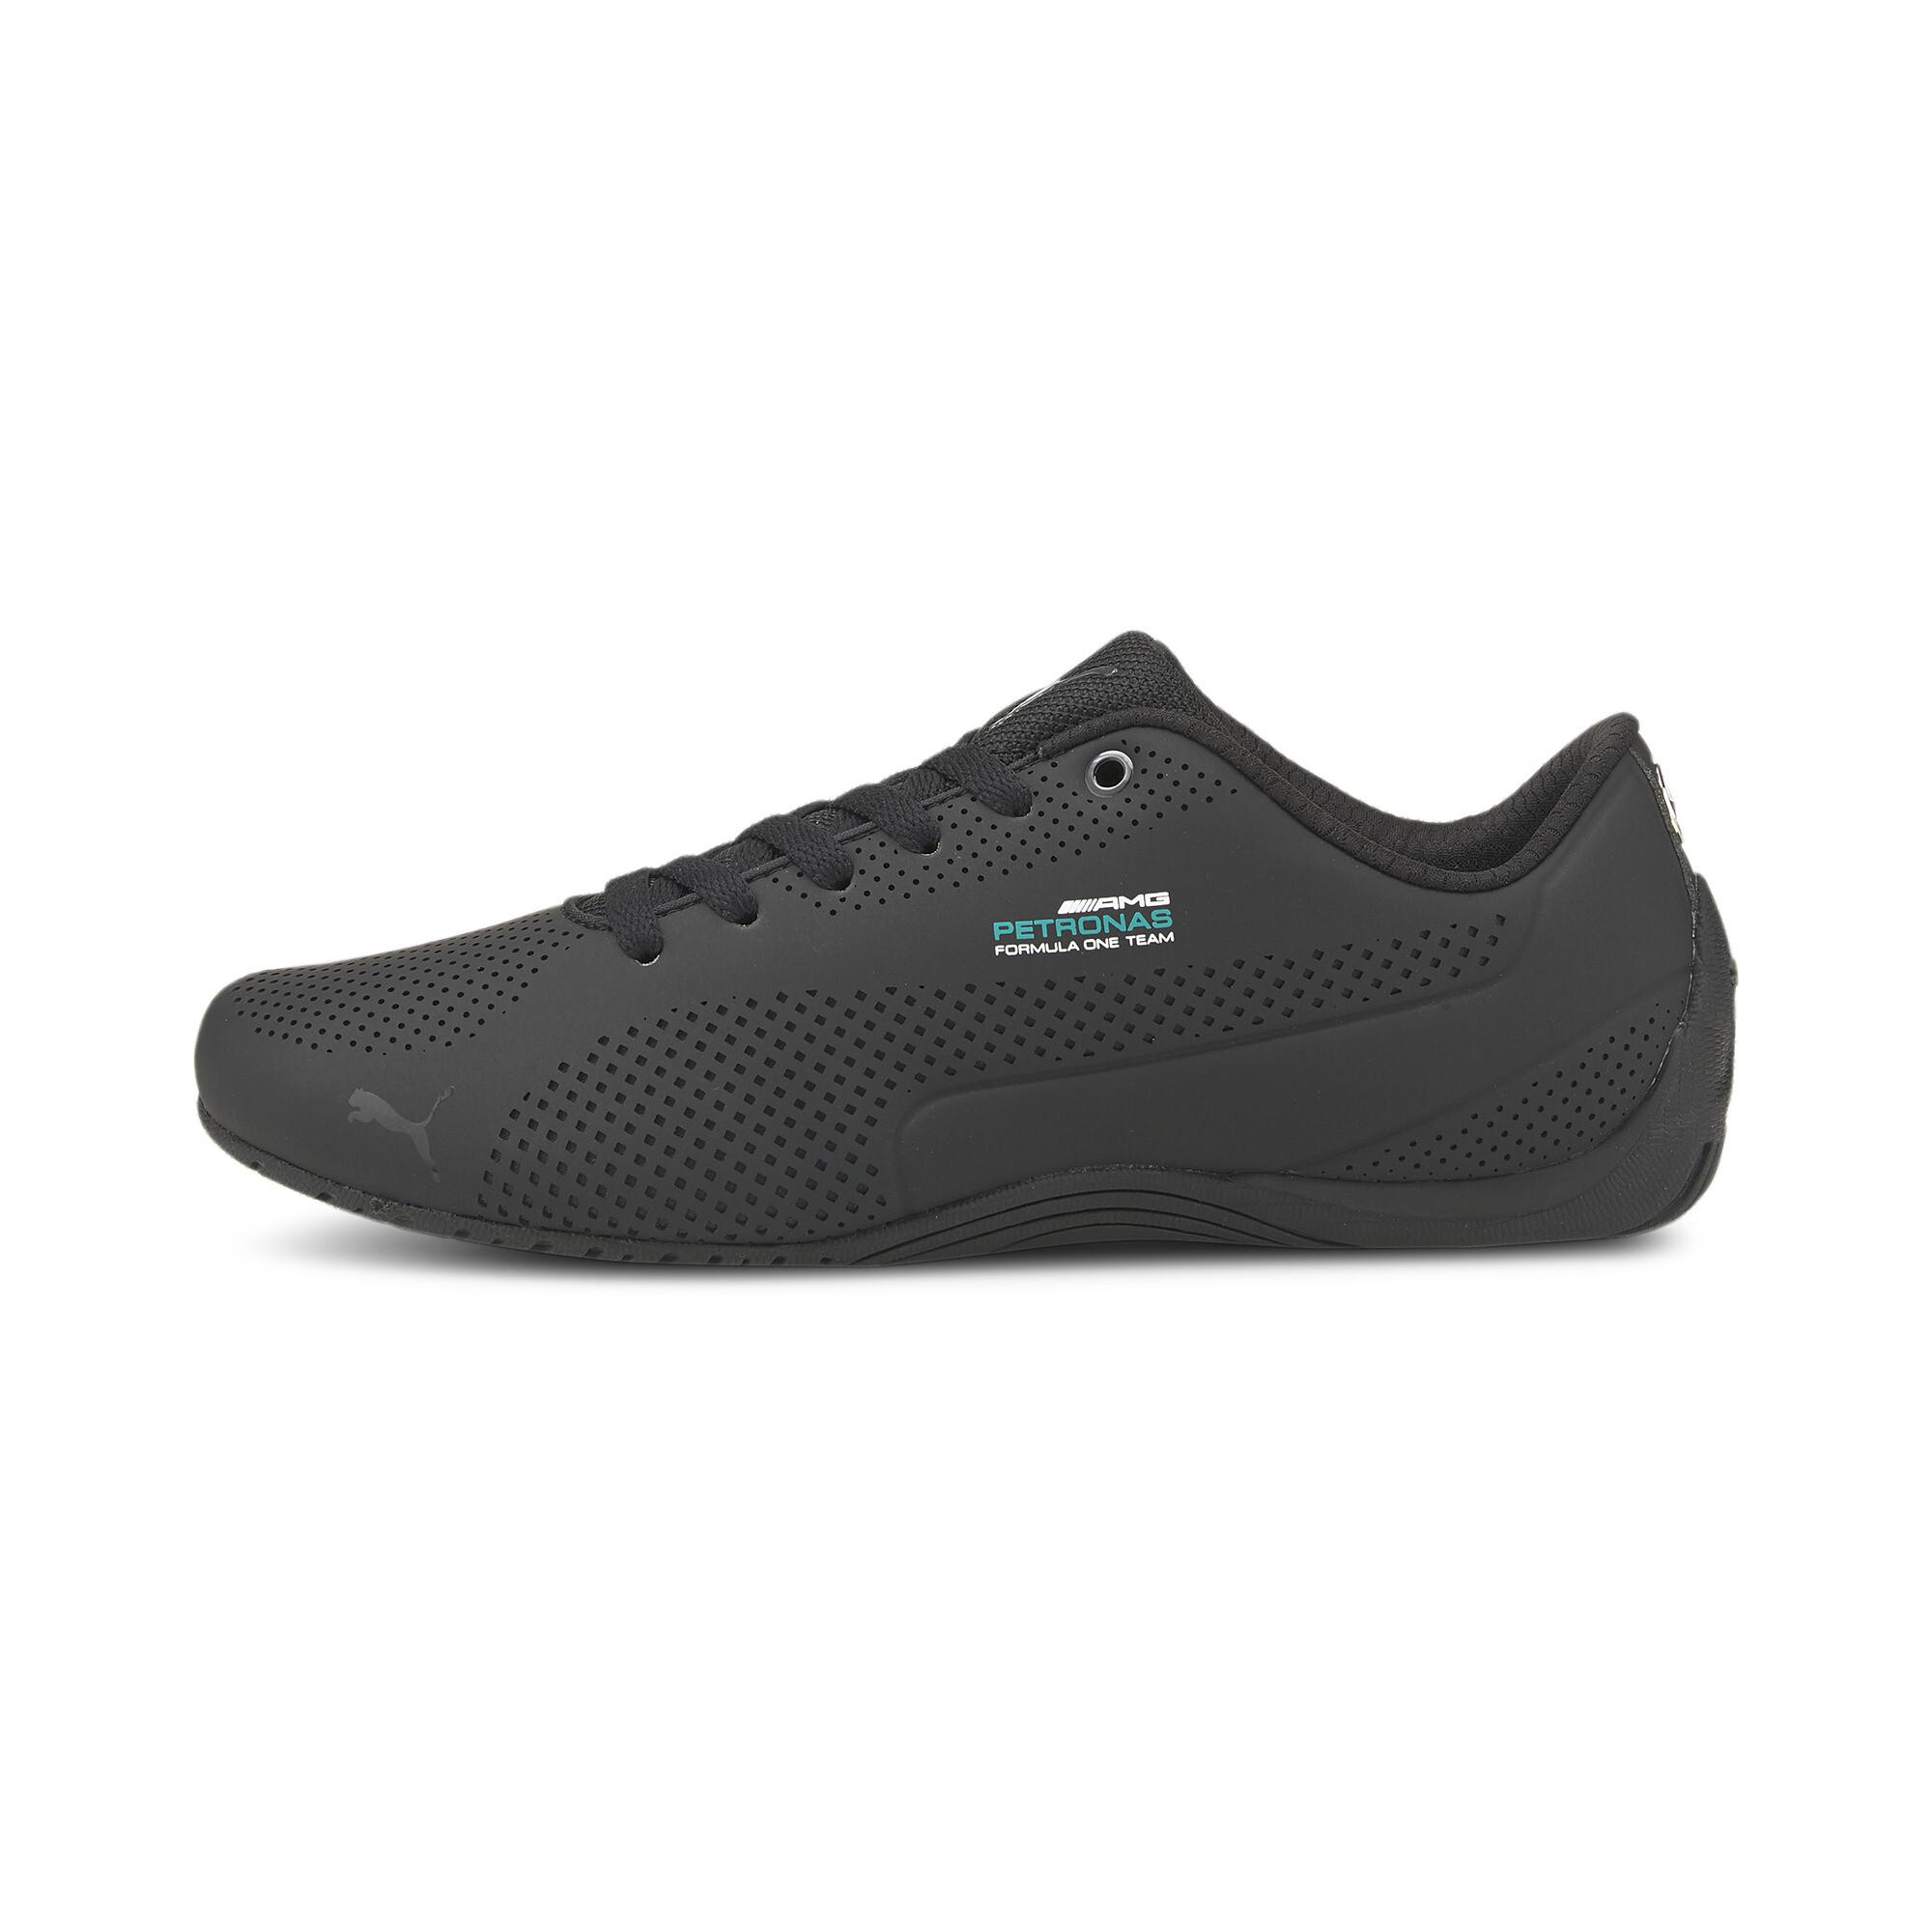 PUMA-MERCEDES-AMG-PETRONAS-Drift-Cat-Ultra-Sneaker-Unisex-Schuhe-Neu Indexbild 9